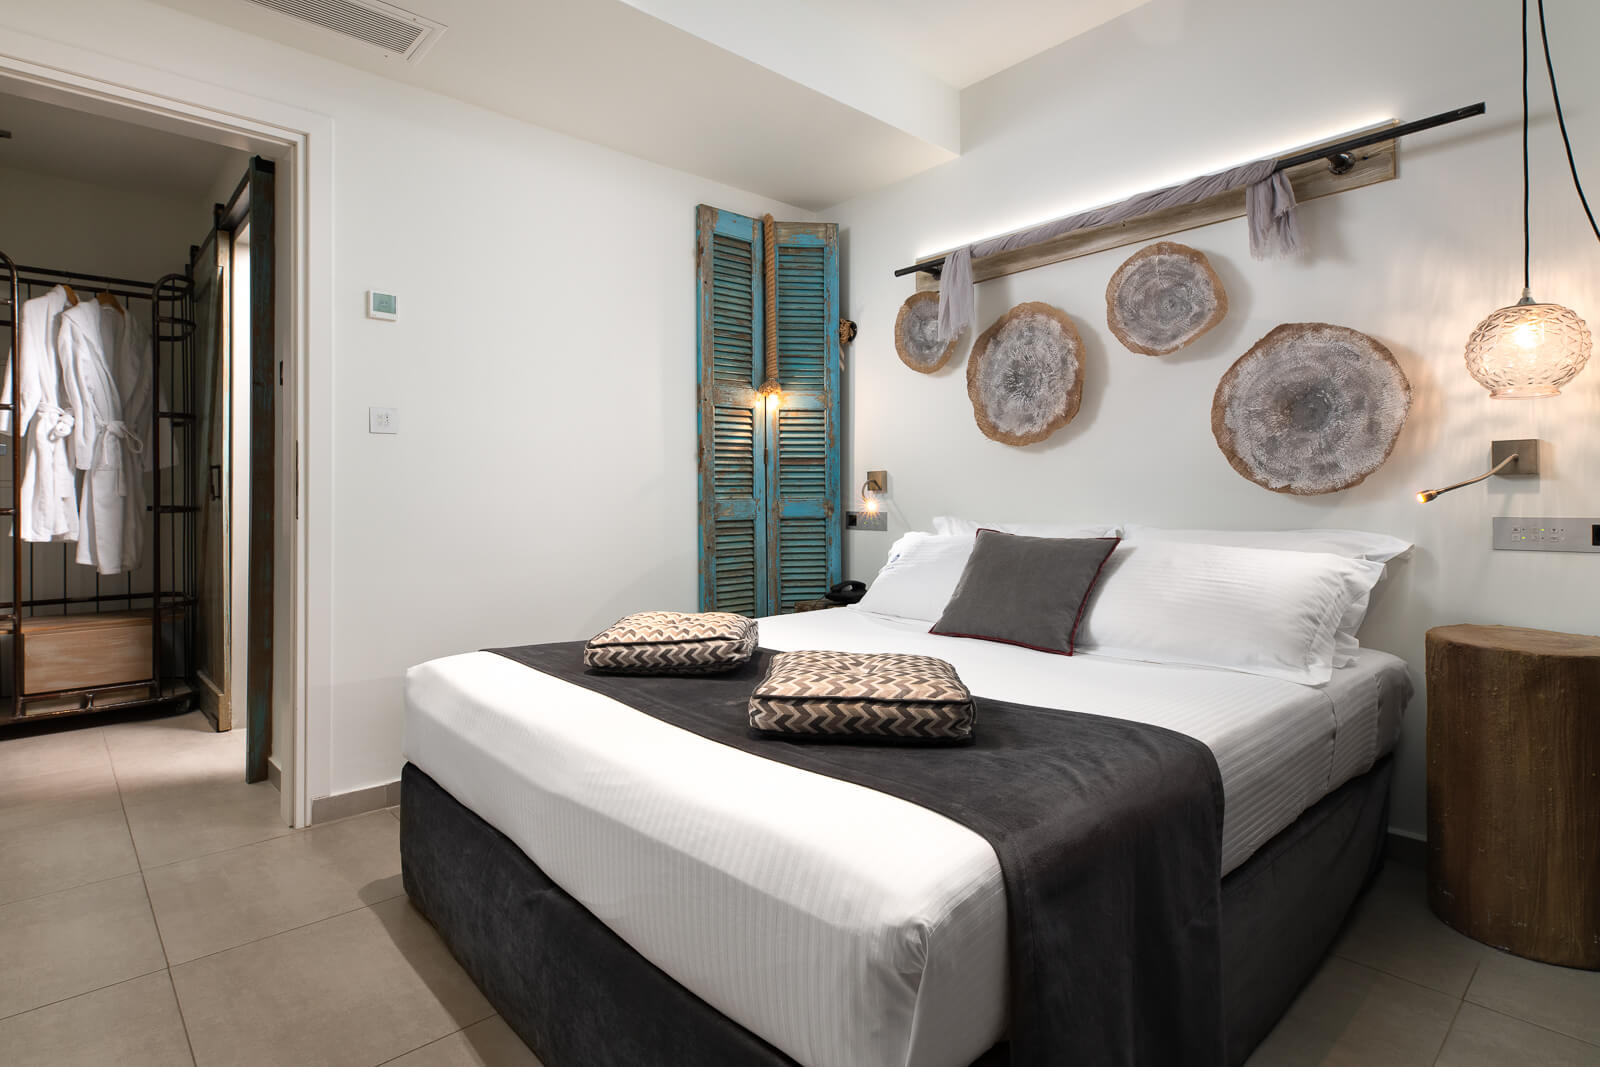 Iviskos Hotel Suite - Elakati Hotel in Rhodes